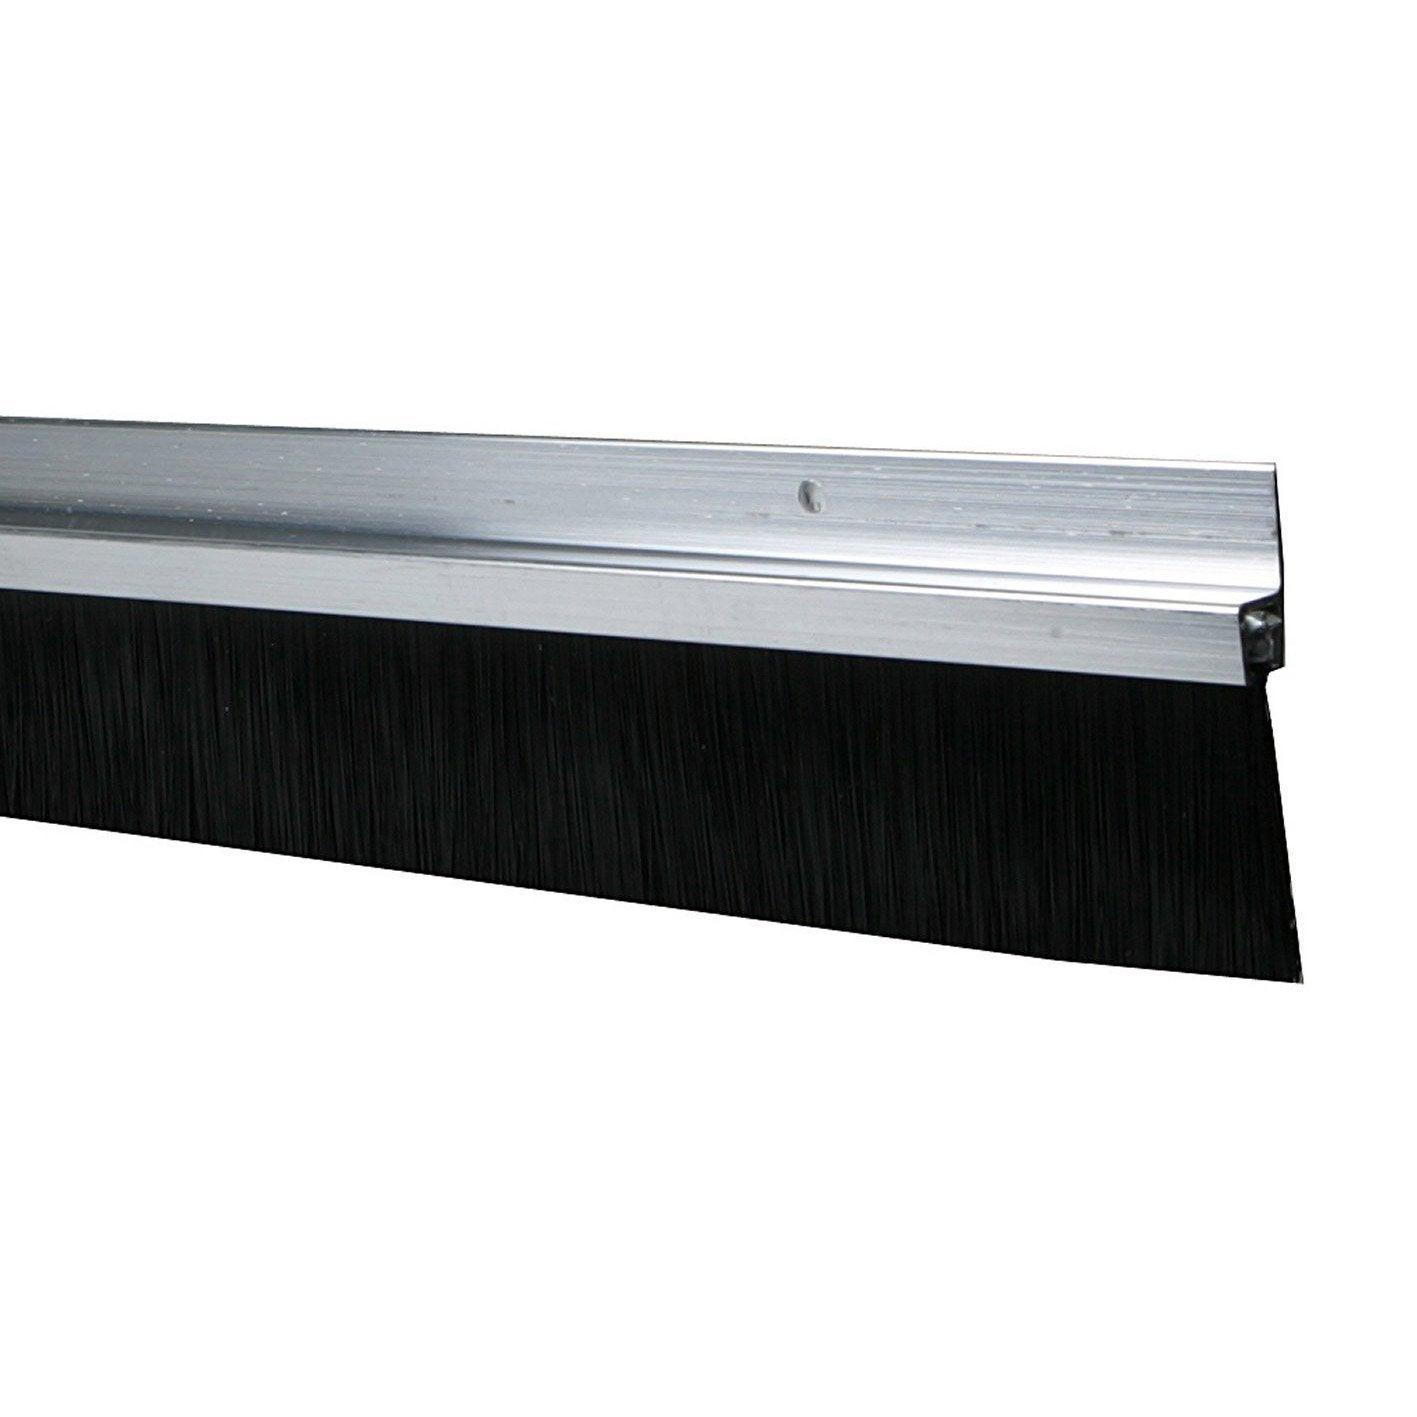 bas de porte visser brosse axton cm aluminium leroy merlin. Black Bedroom Furniture Sets. Home Design Ideas